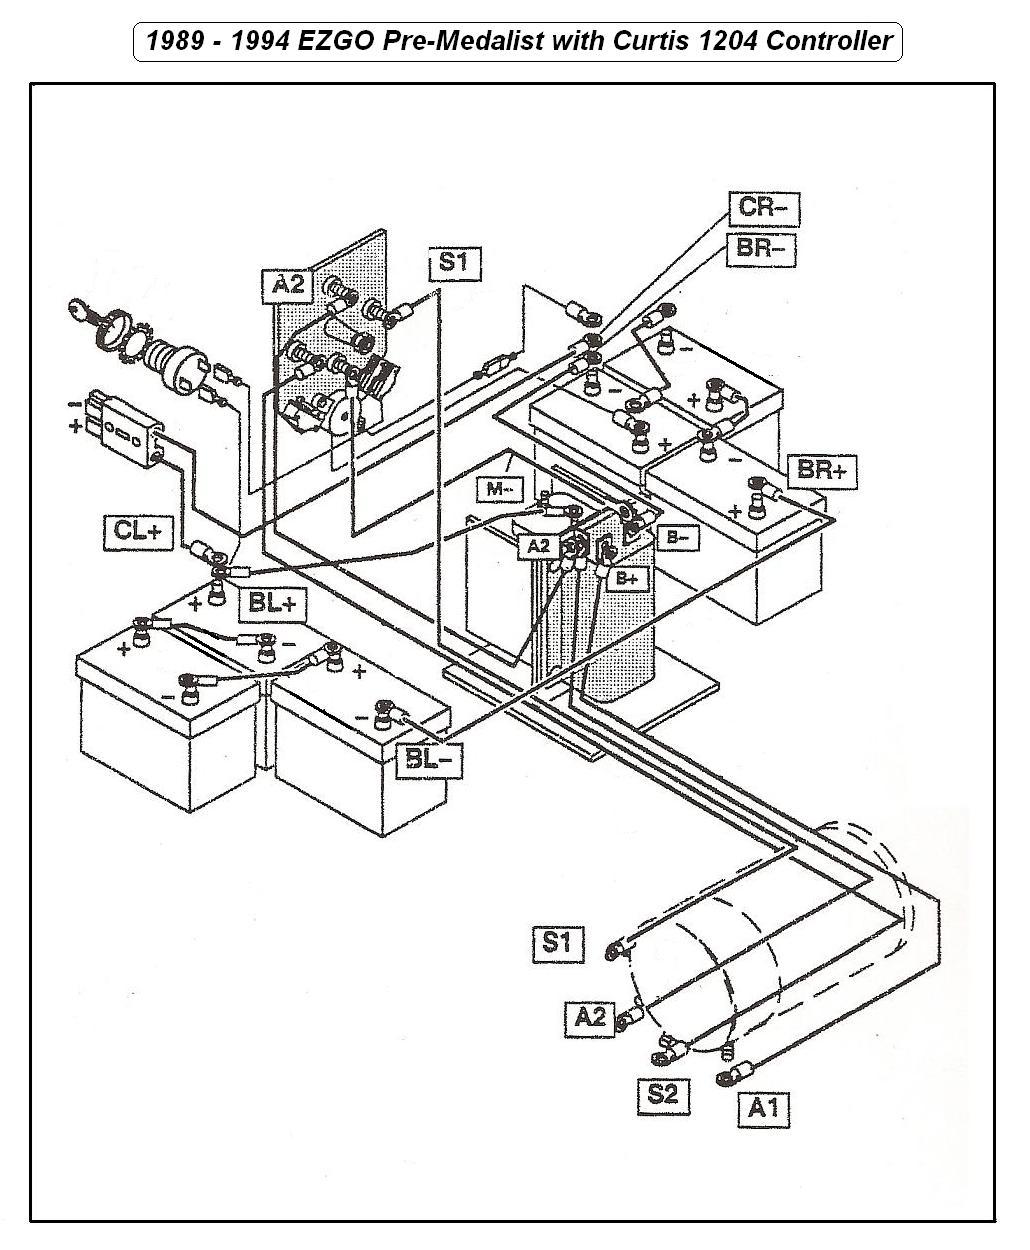 Ez Go Golf Cart Wiring Diagram - Deltagenerali - Ezgo Wiring Diagram